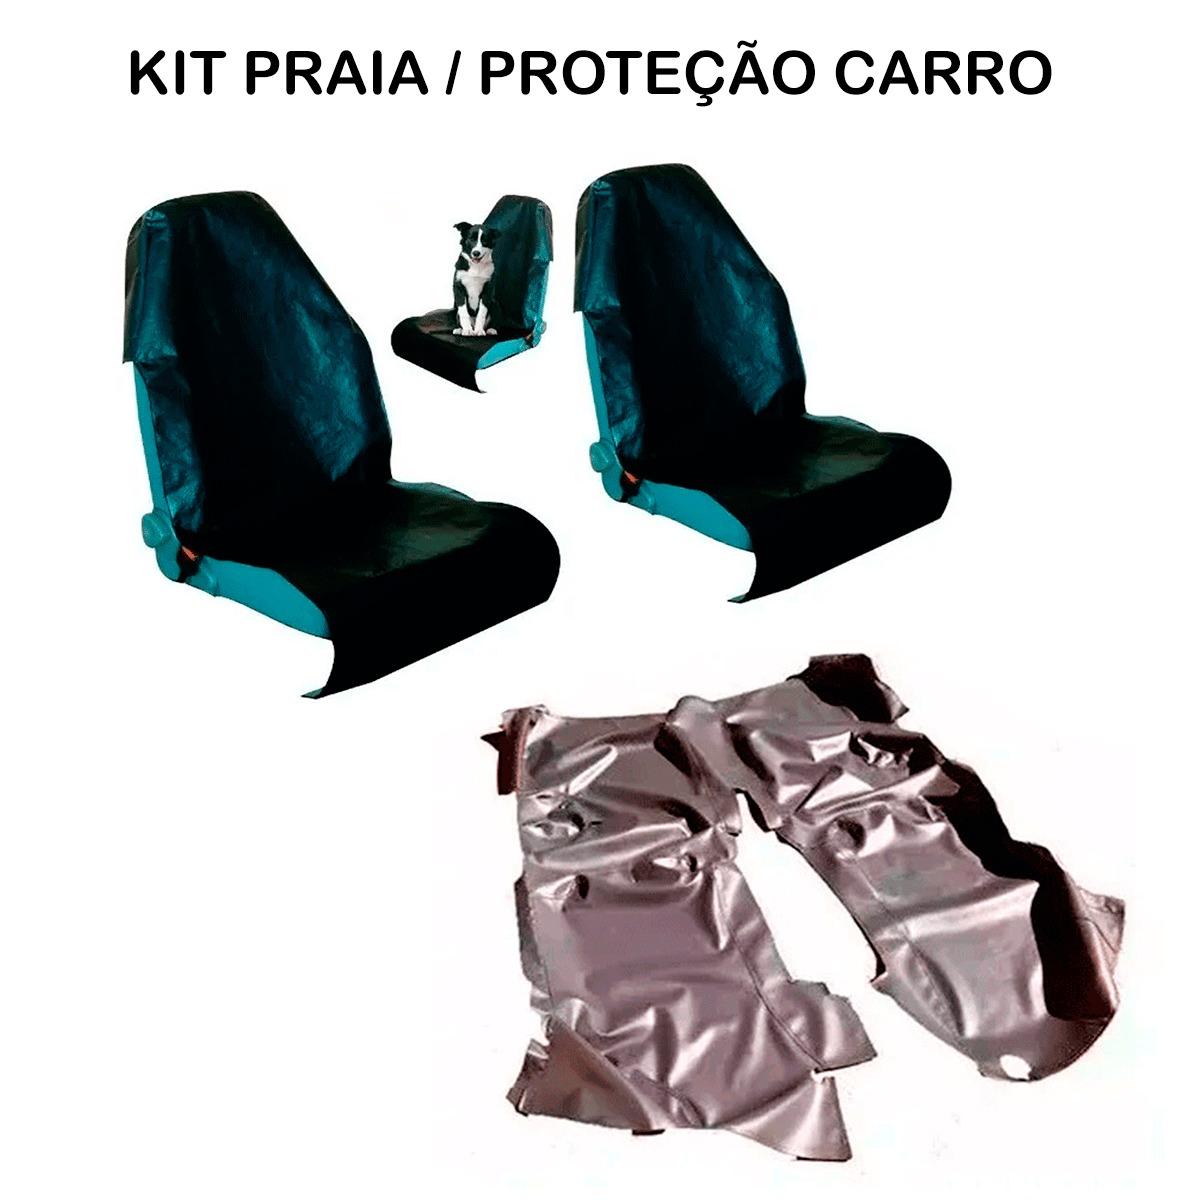 Tapete Em Vinil Ford Pampa todos + Capa Banco Protecao Banco Areia Suor Academia